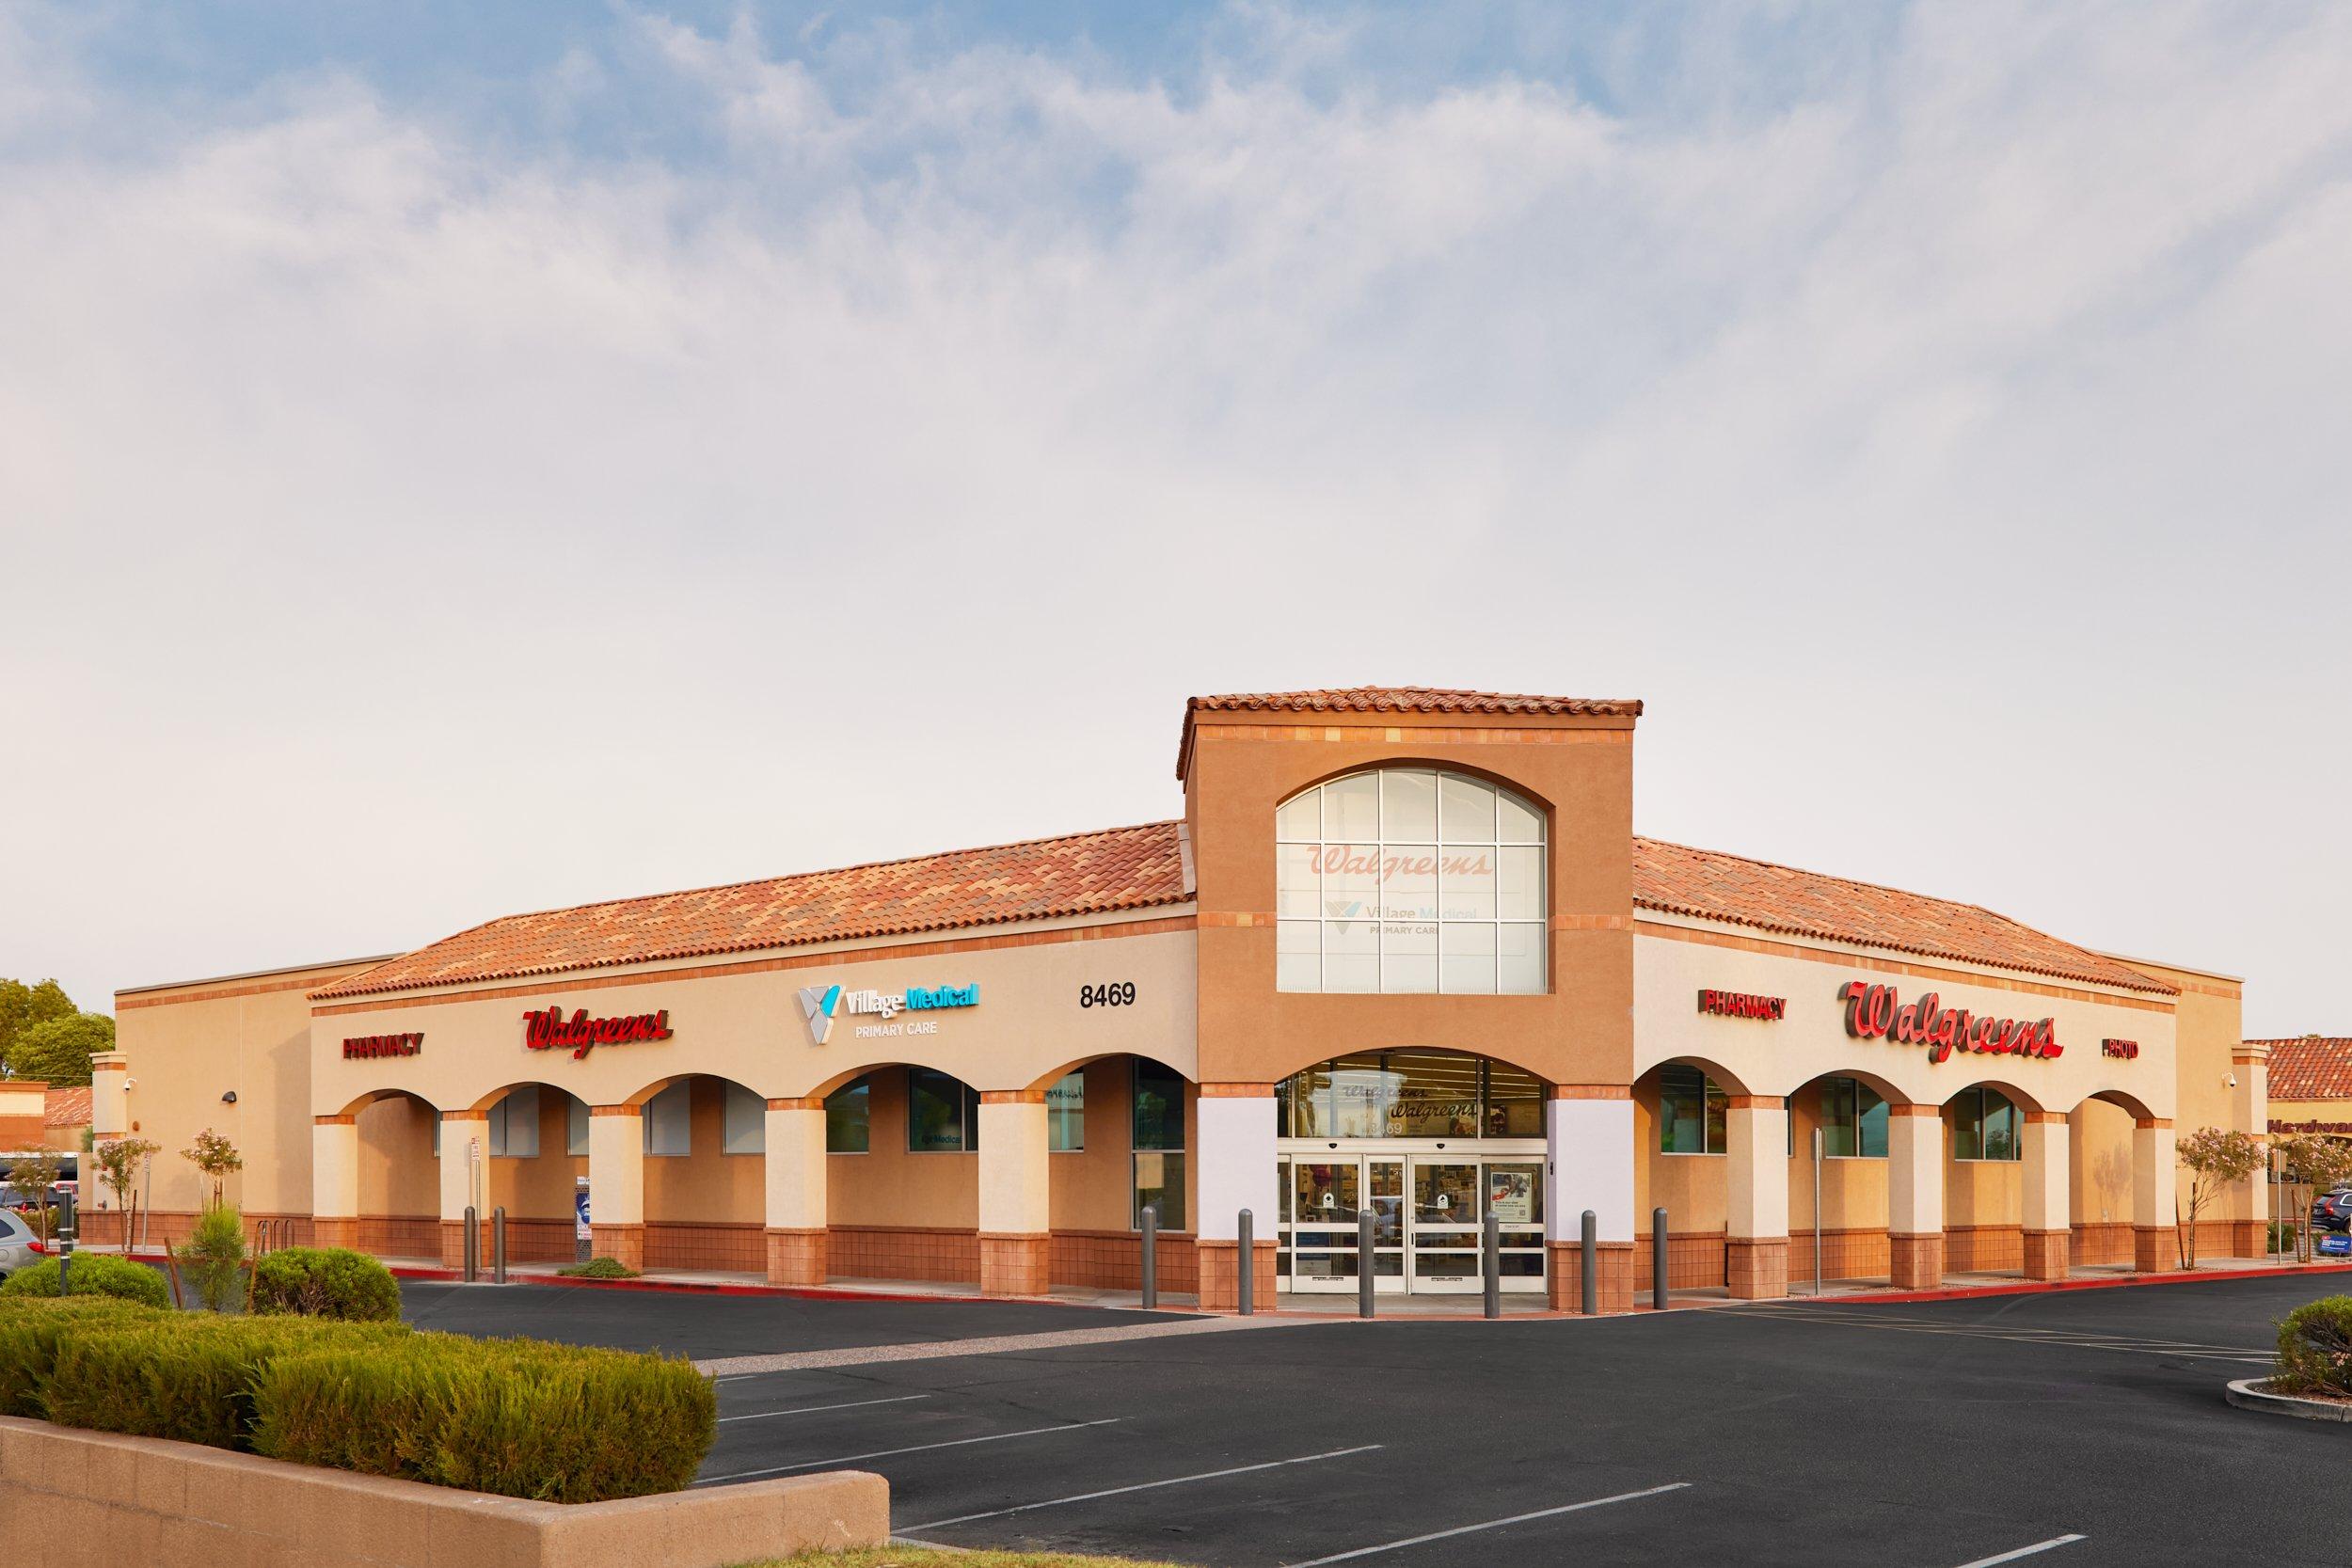 Village Medical at Walgreens - 8469 E. McDonald Dr Suite 100 Scottsdale, AZ 85250